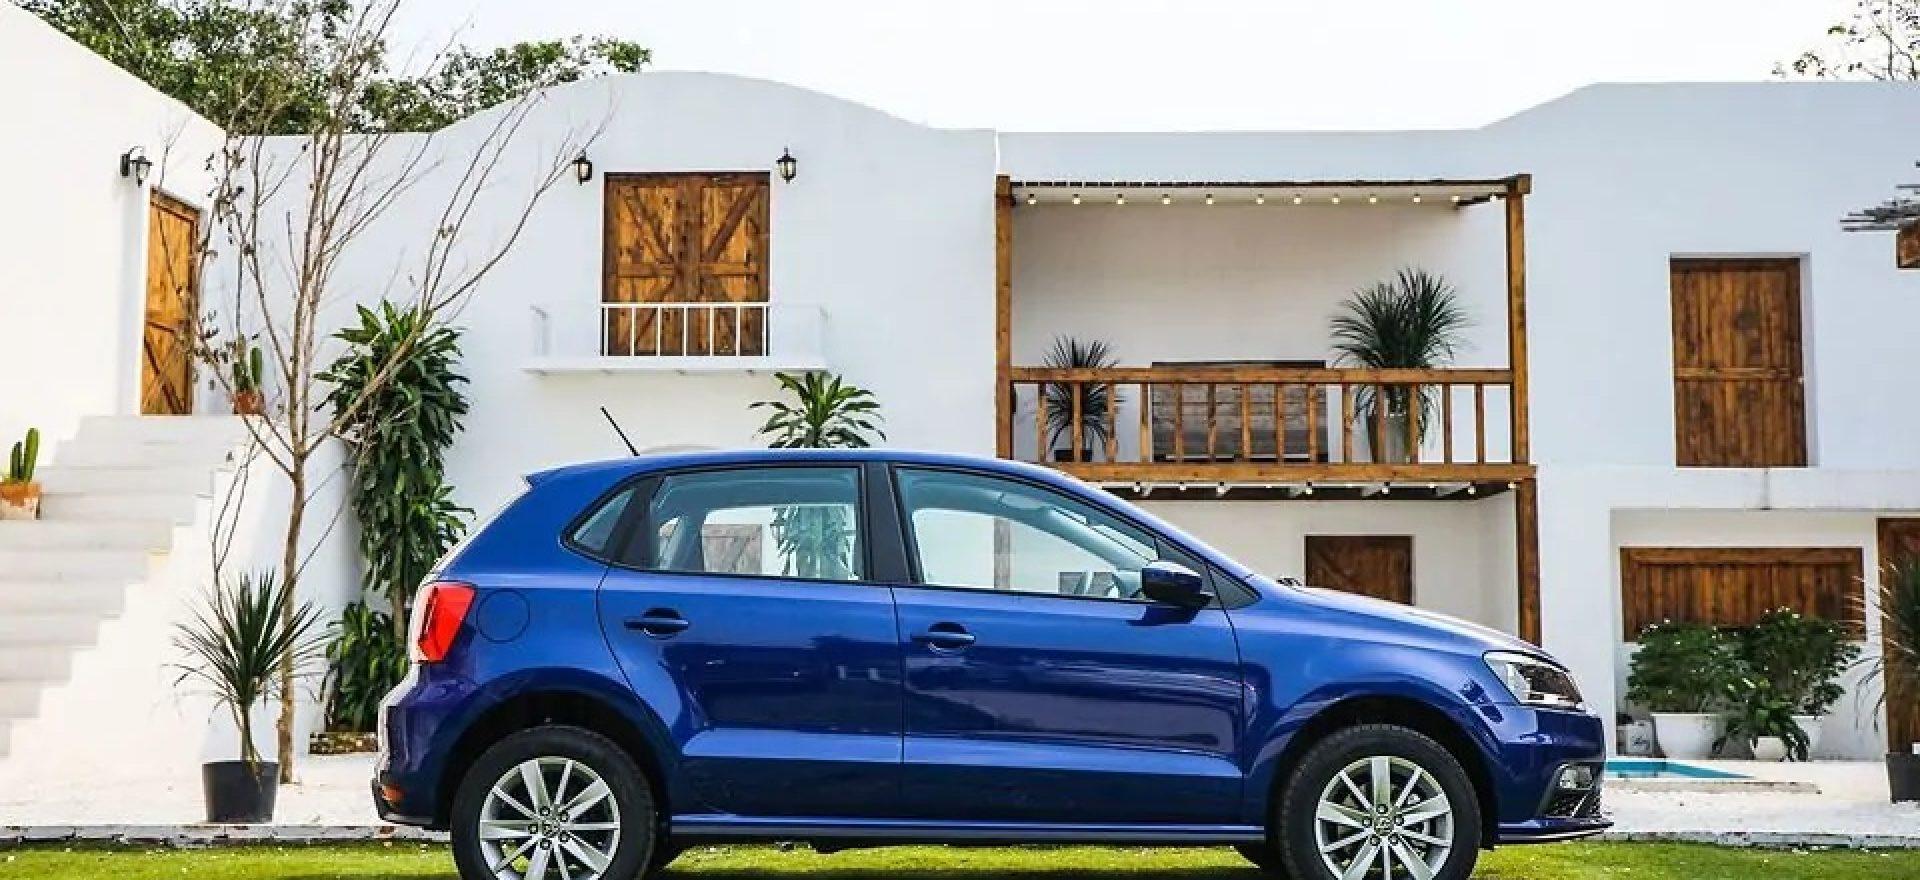 polo-hatchback-xanh-duong-9910511.jpg